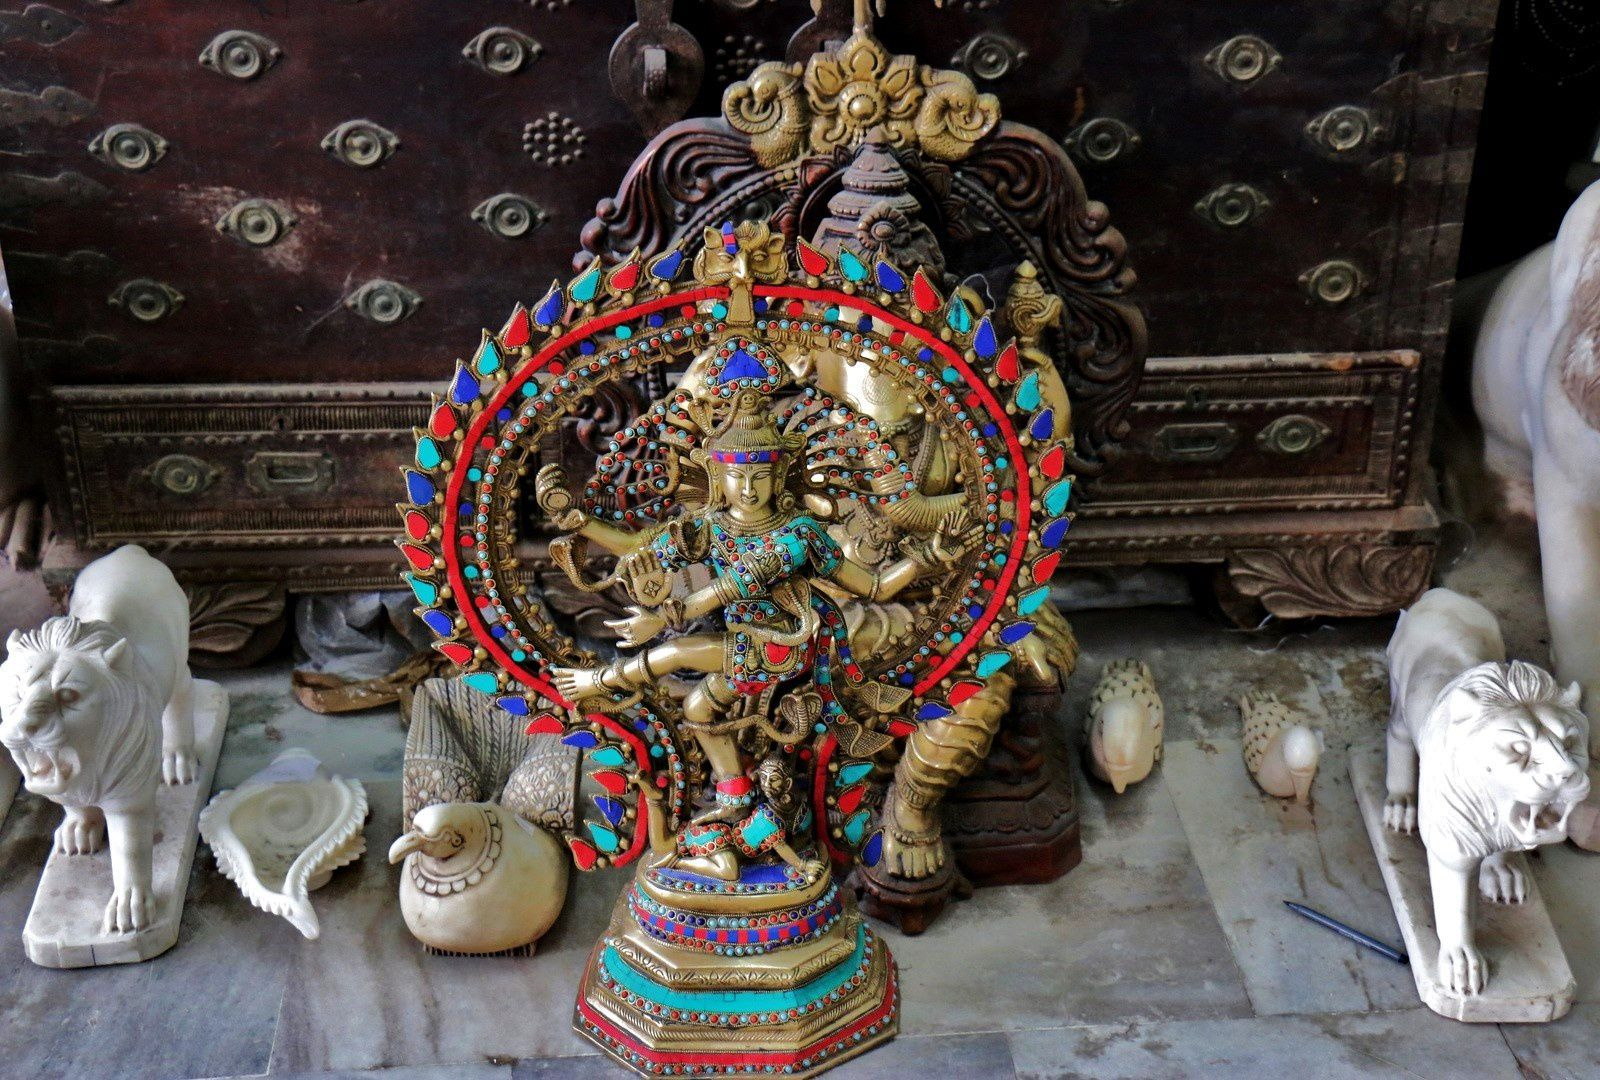 Maharani Textile (sculptures et objets divers, 1/2), Jodhpur (Inde)